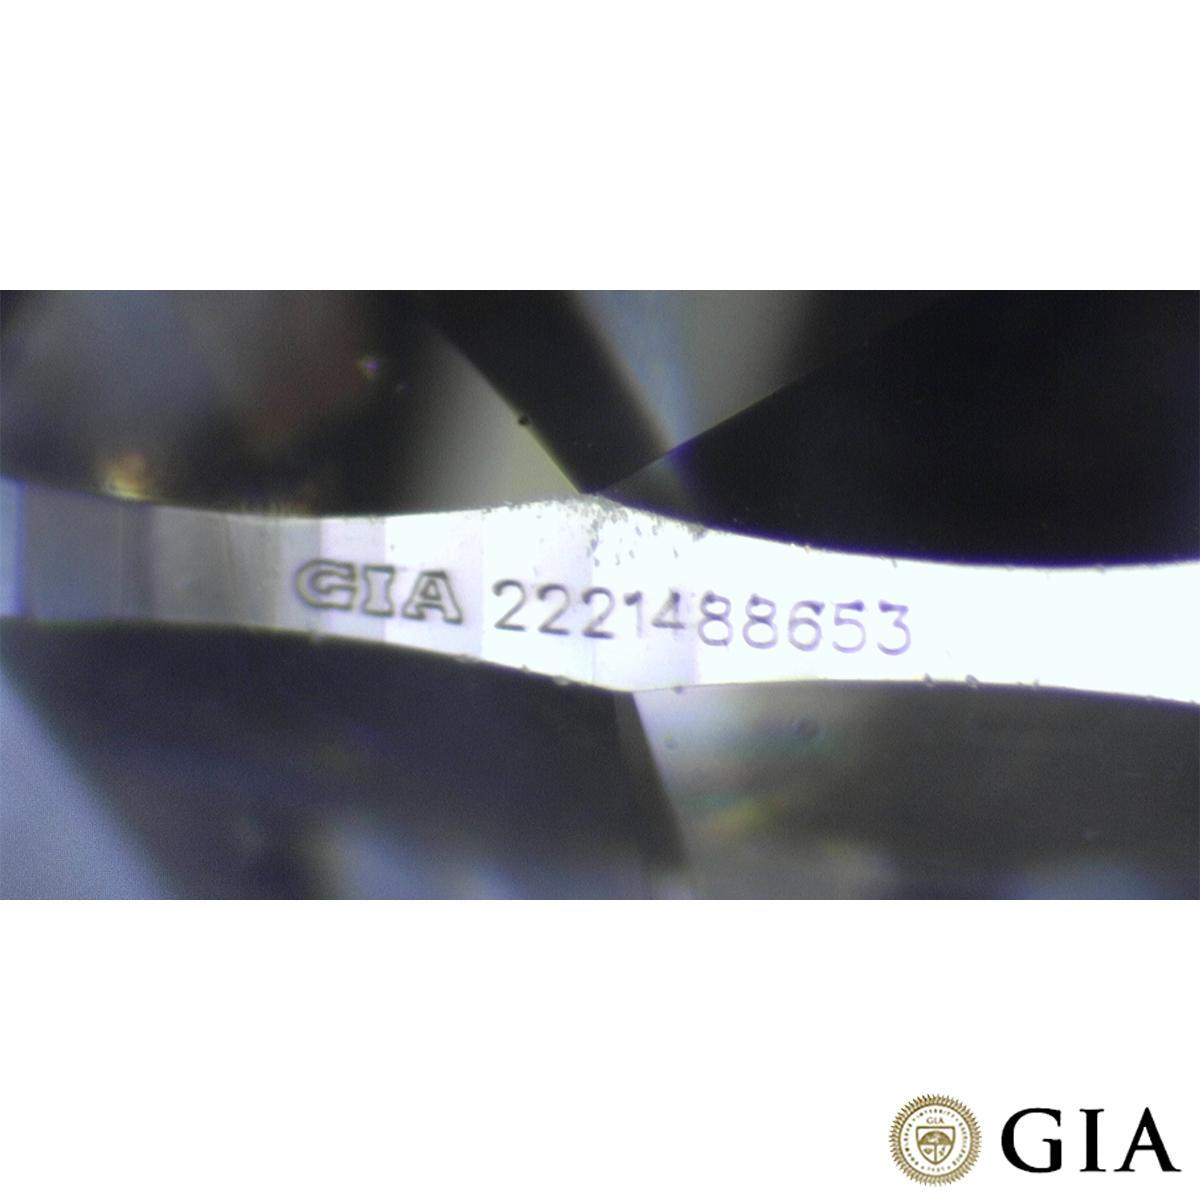 18k White Gold Round Brilliant Cut Diamond Ring 0.91ct F/VVS2